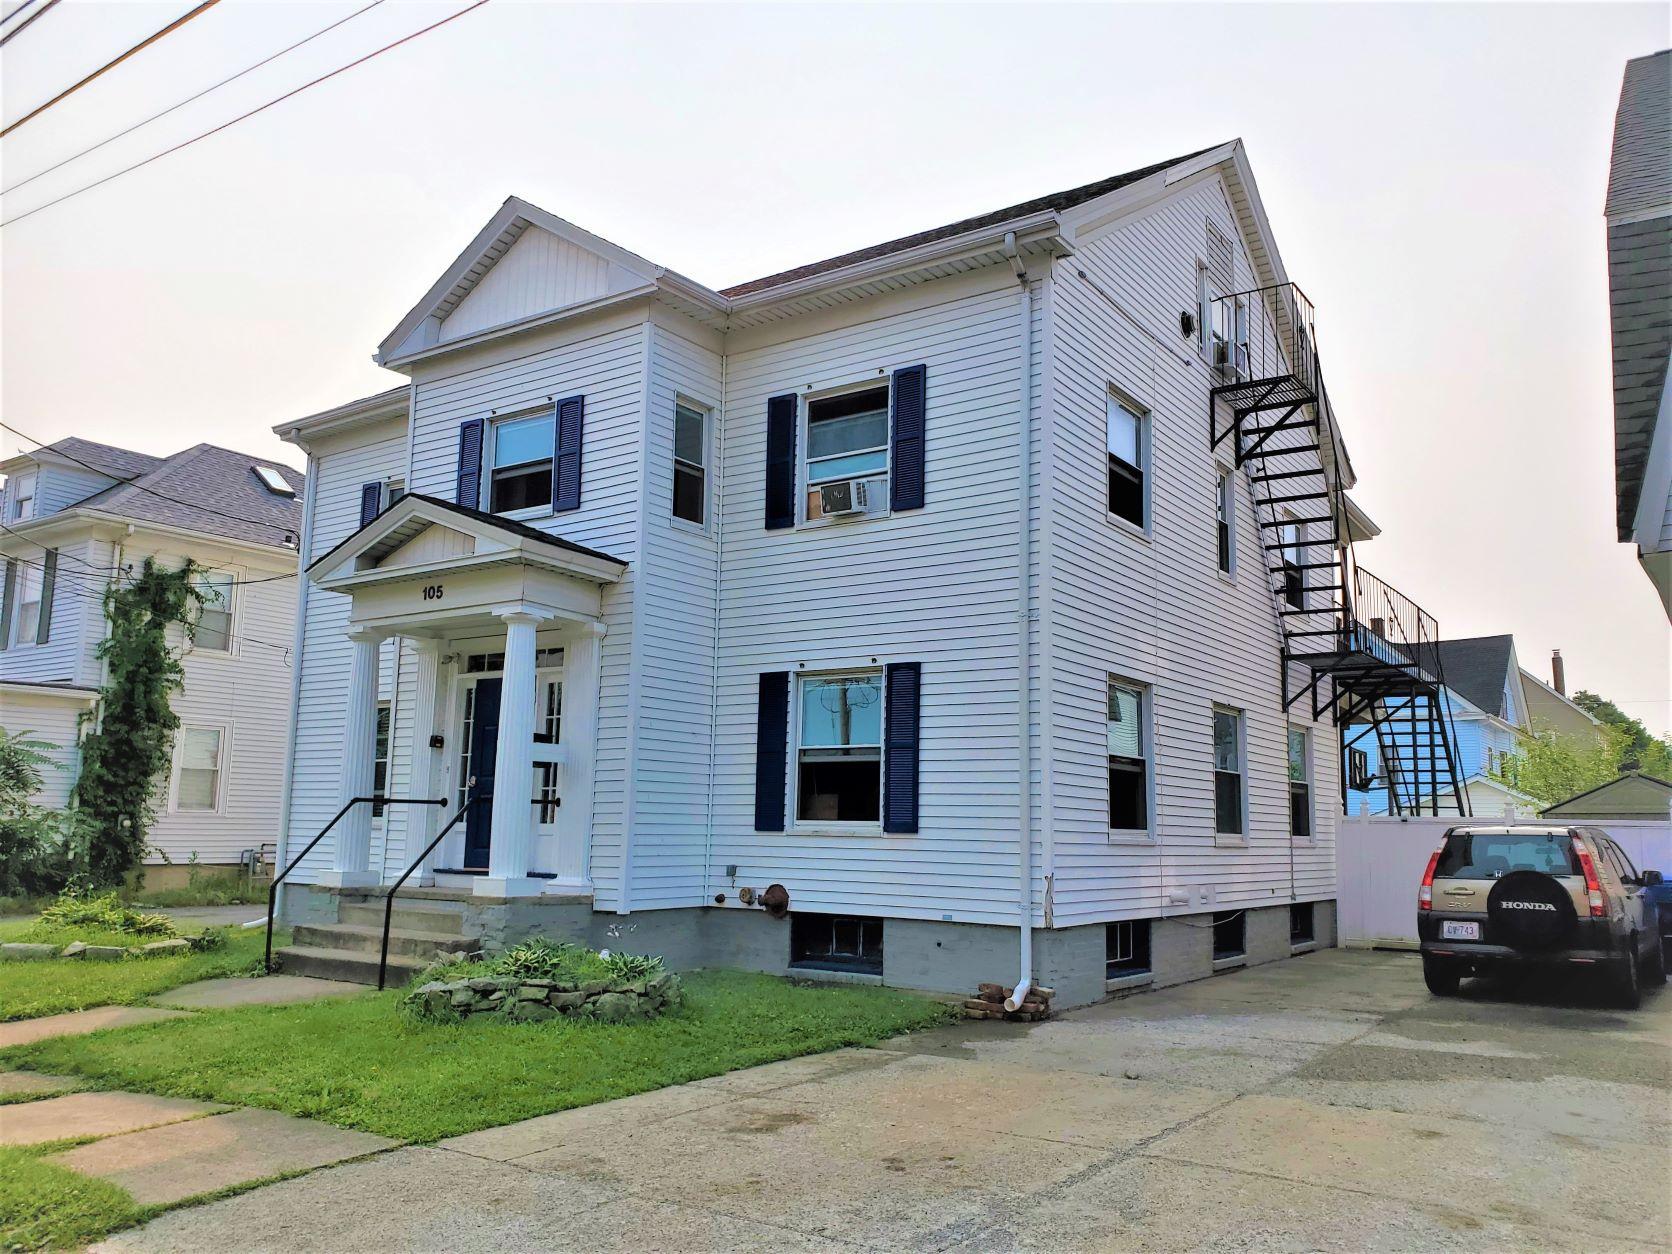 Kayaly Sober House │ Sober Living for Men in Pawtucket, Rhode Island